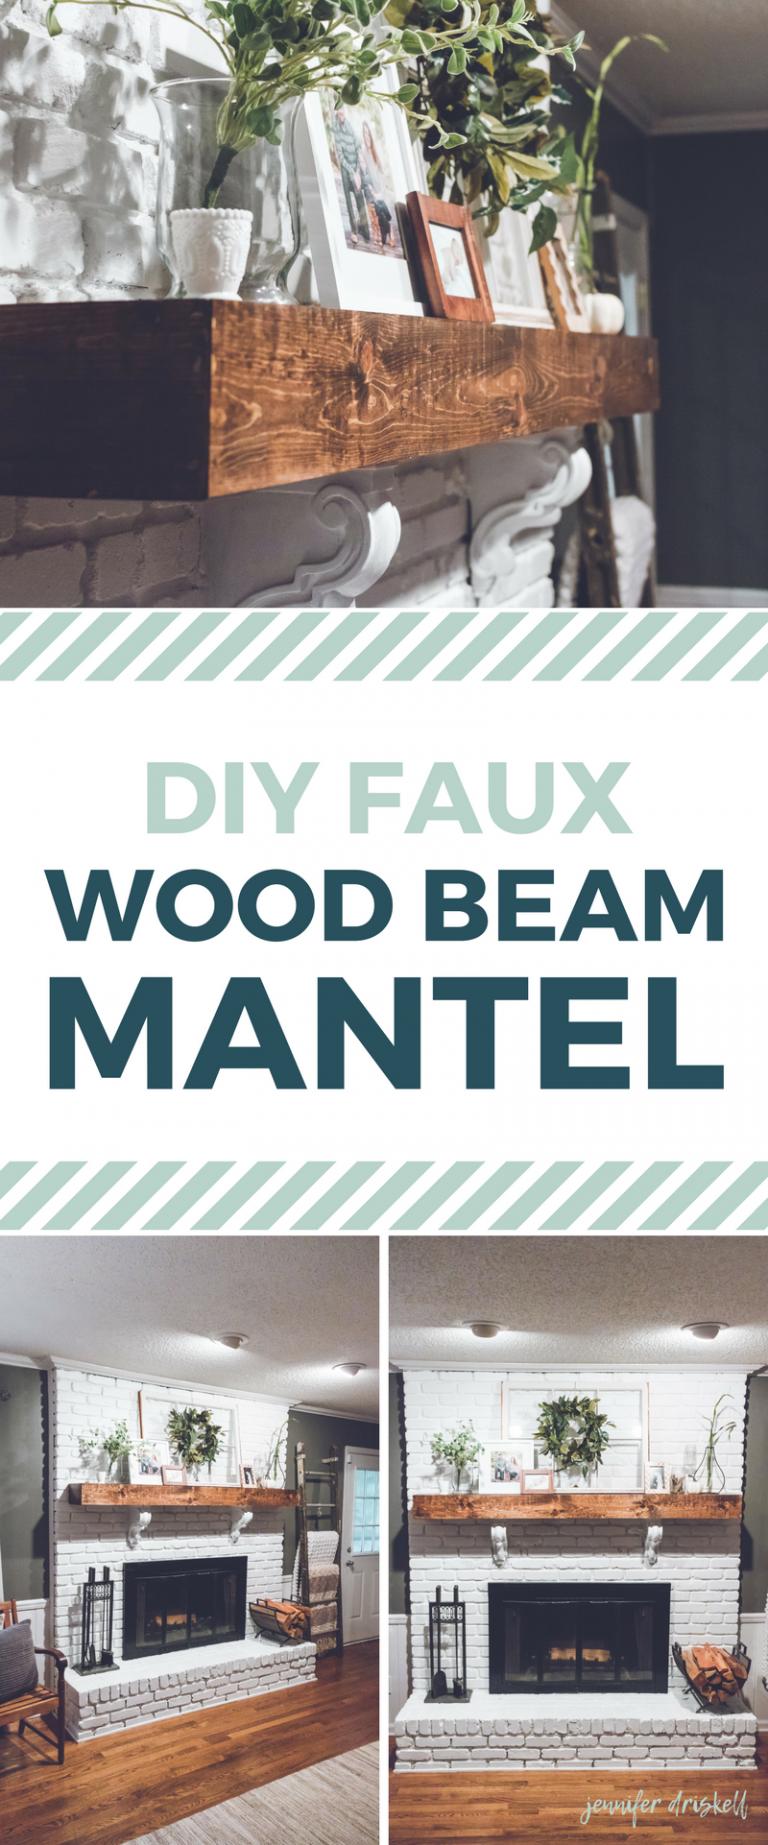 DIY Faux Wood Beam Mantle Farmhousestyle white brick fireplace